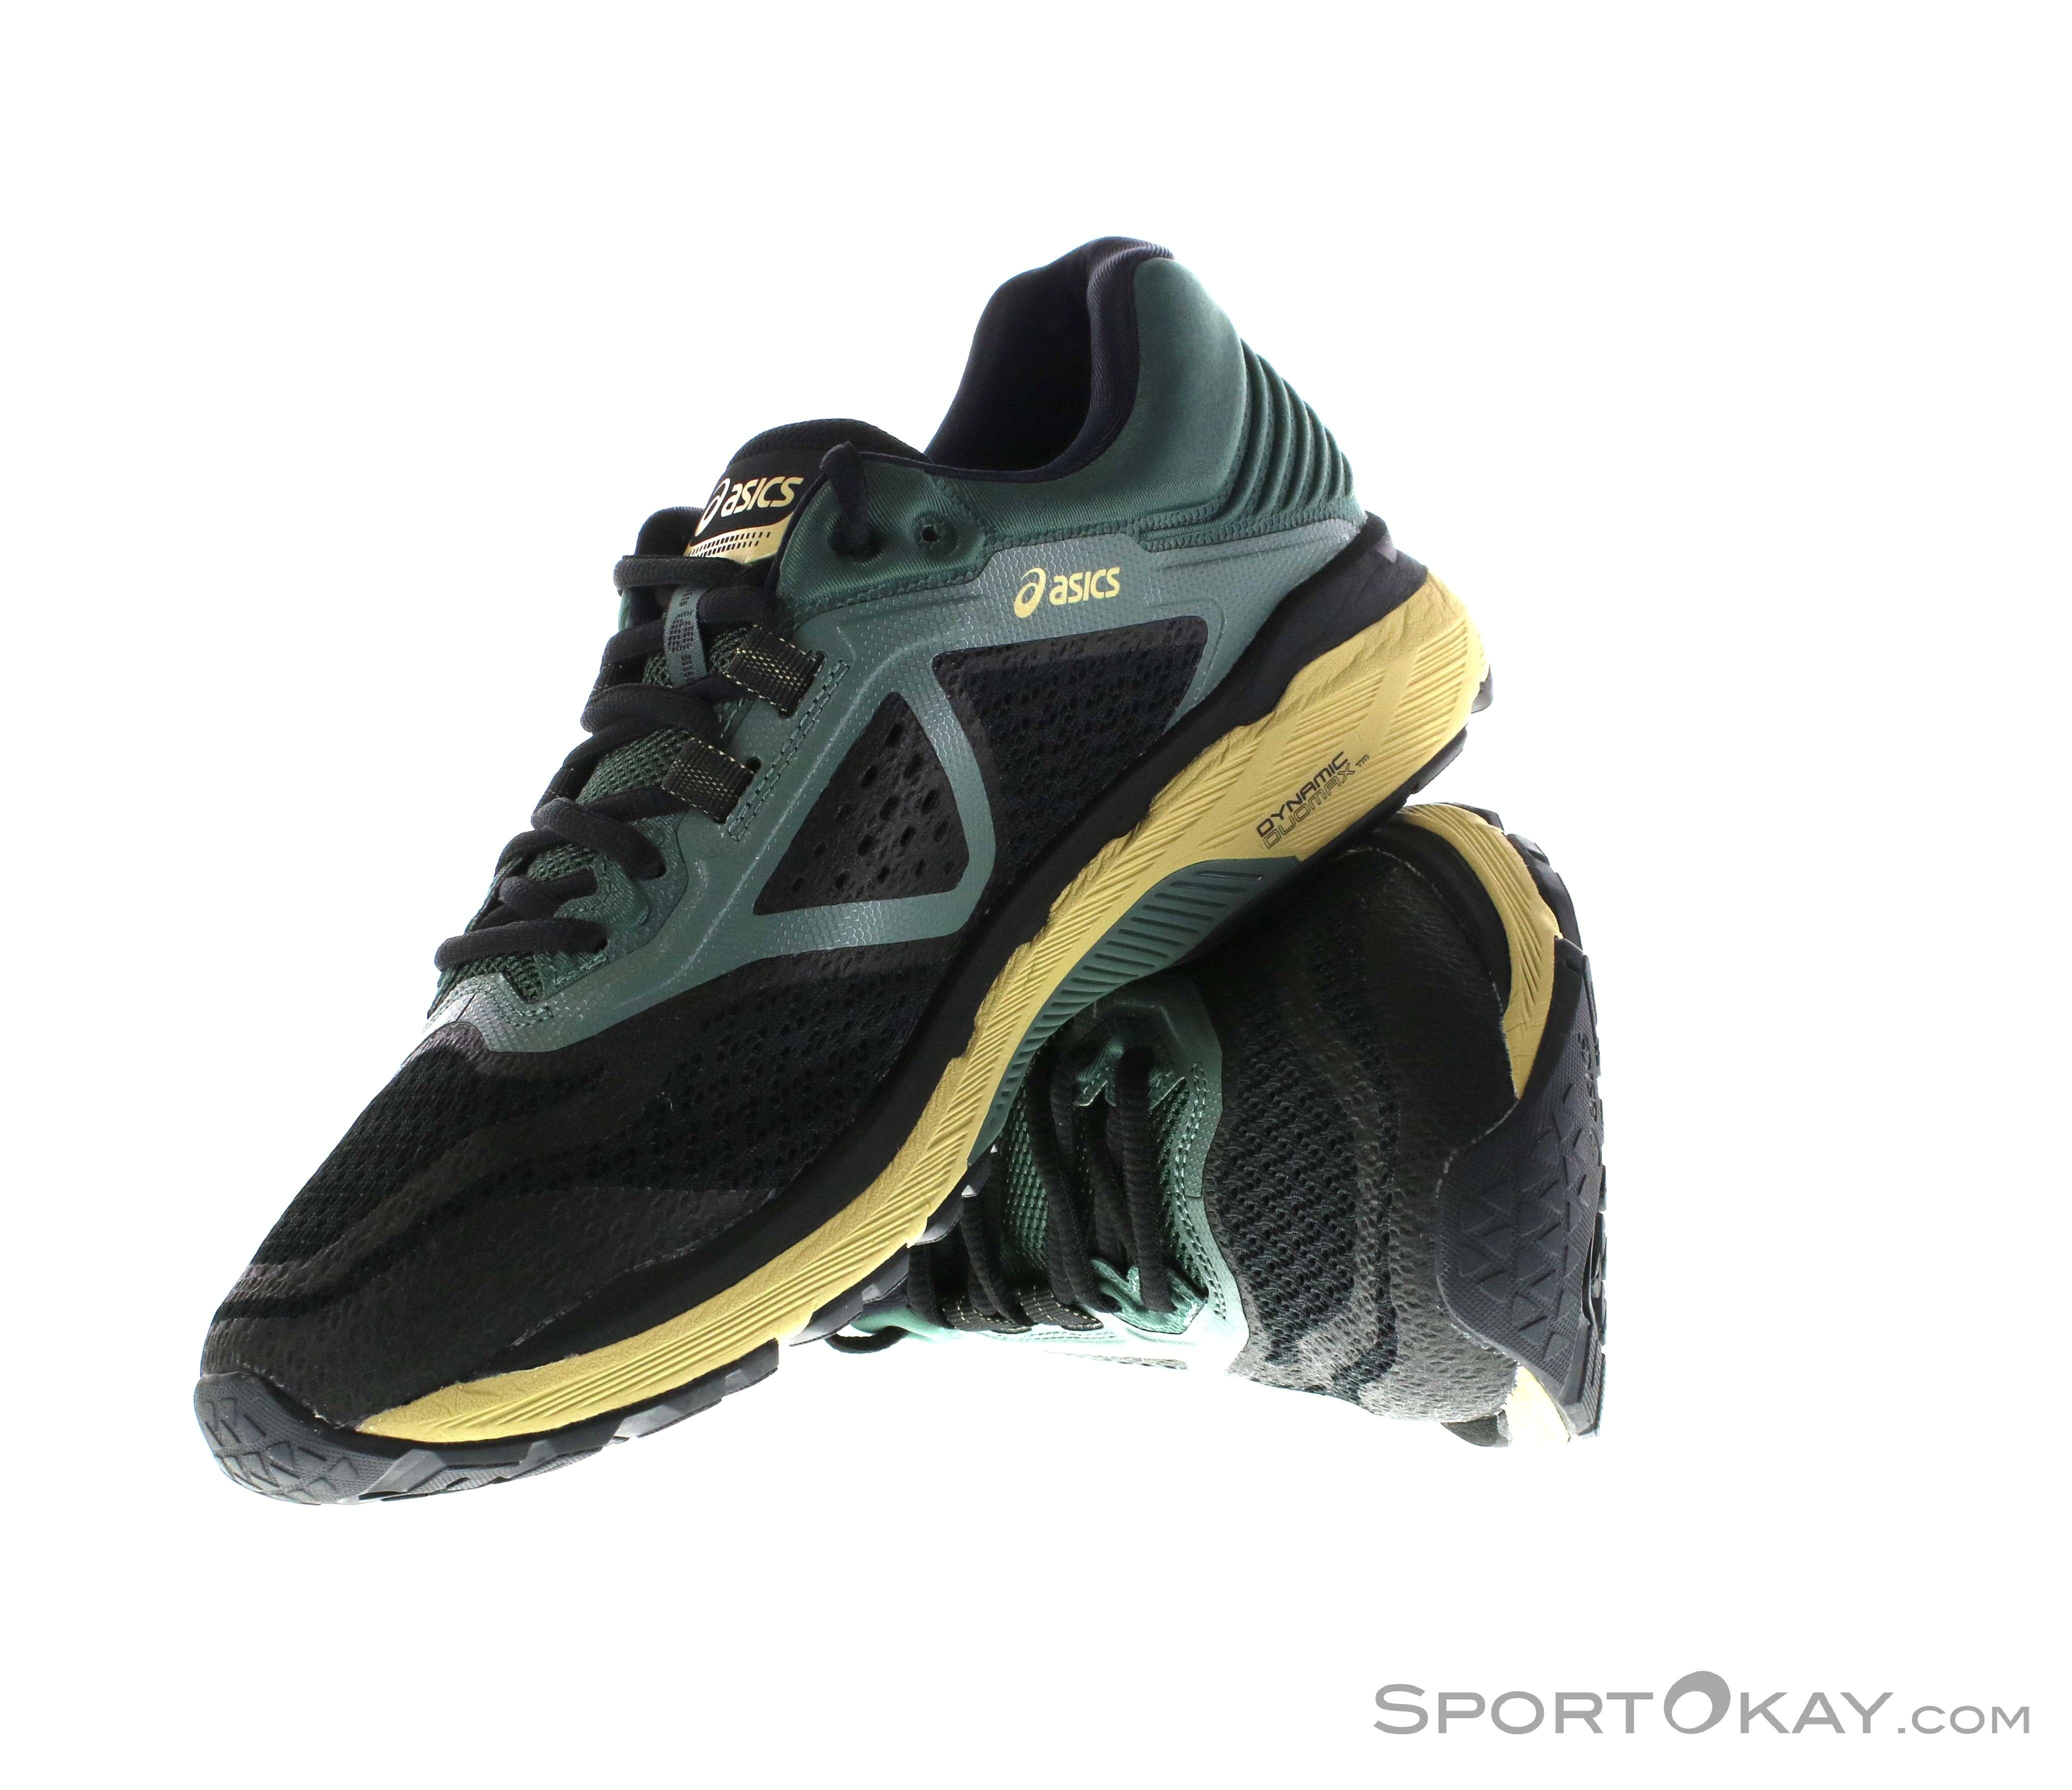 c6b49adf78a Asics GT 2000 6 Trail Plasma Guard Mens Trail Running Shoes - All ...